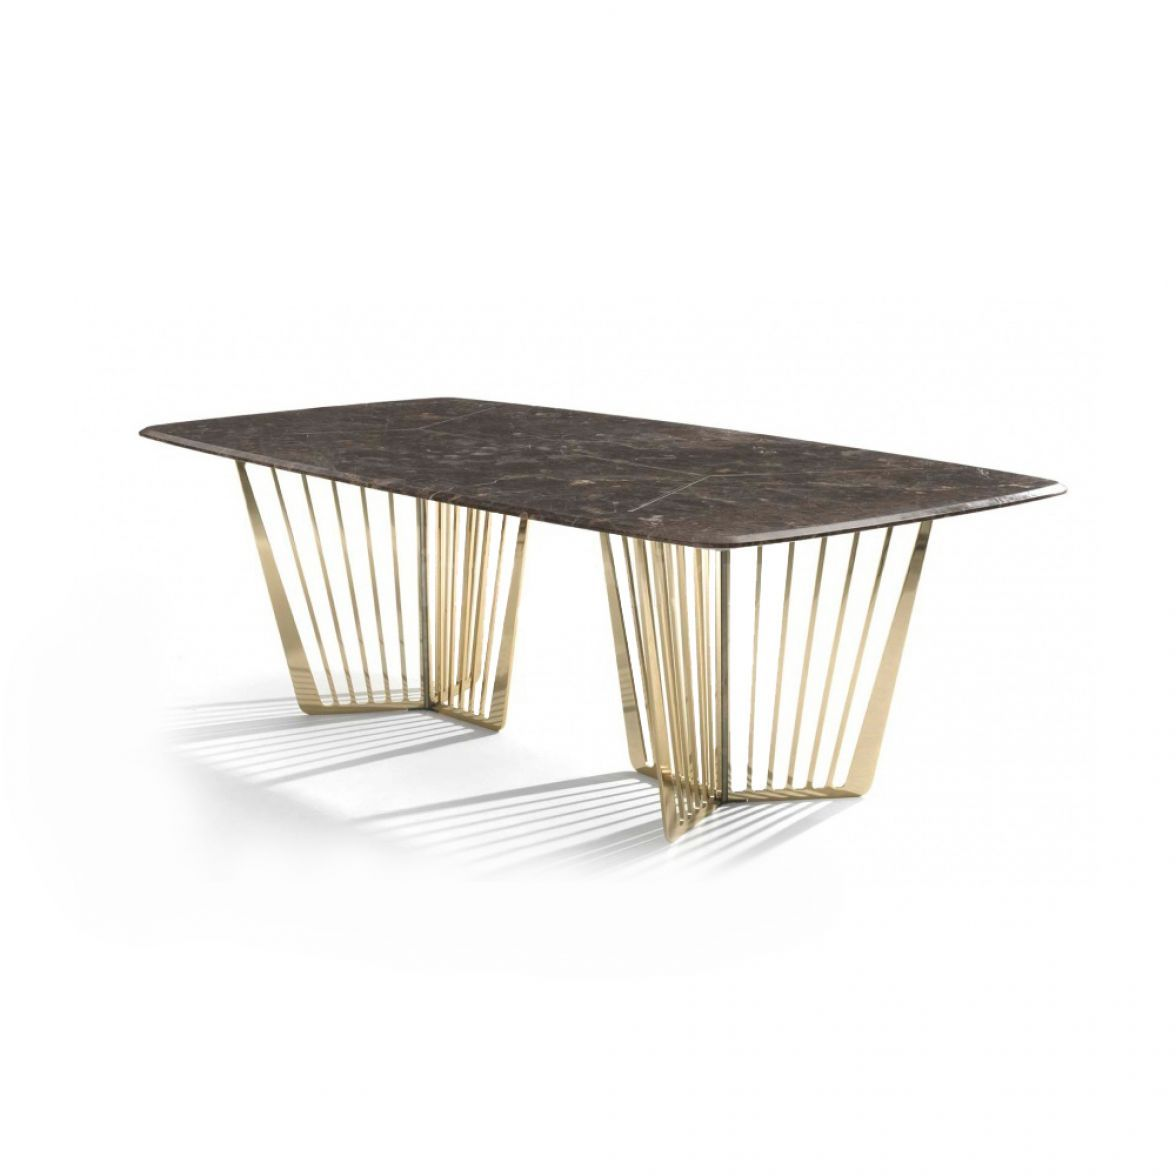 Alfieri table